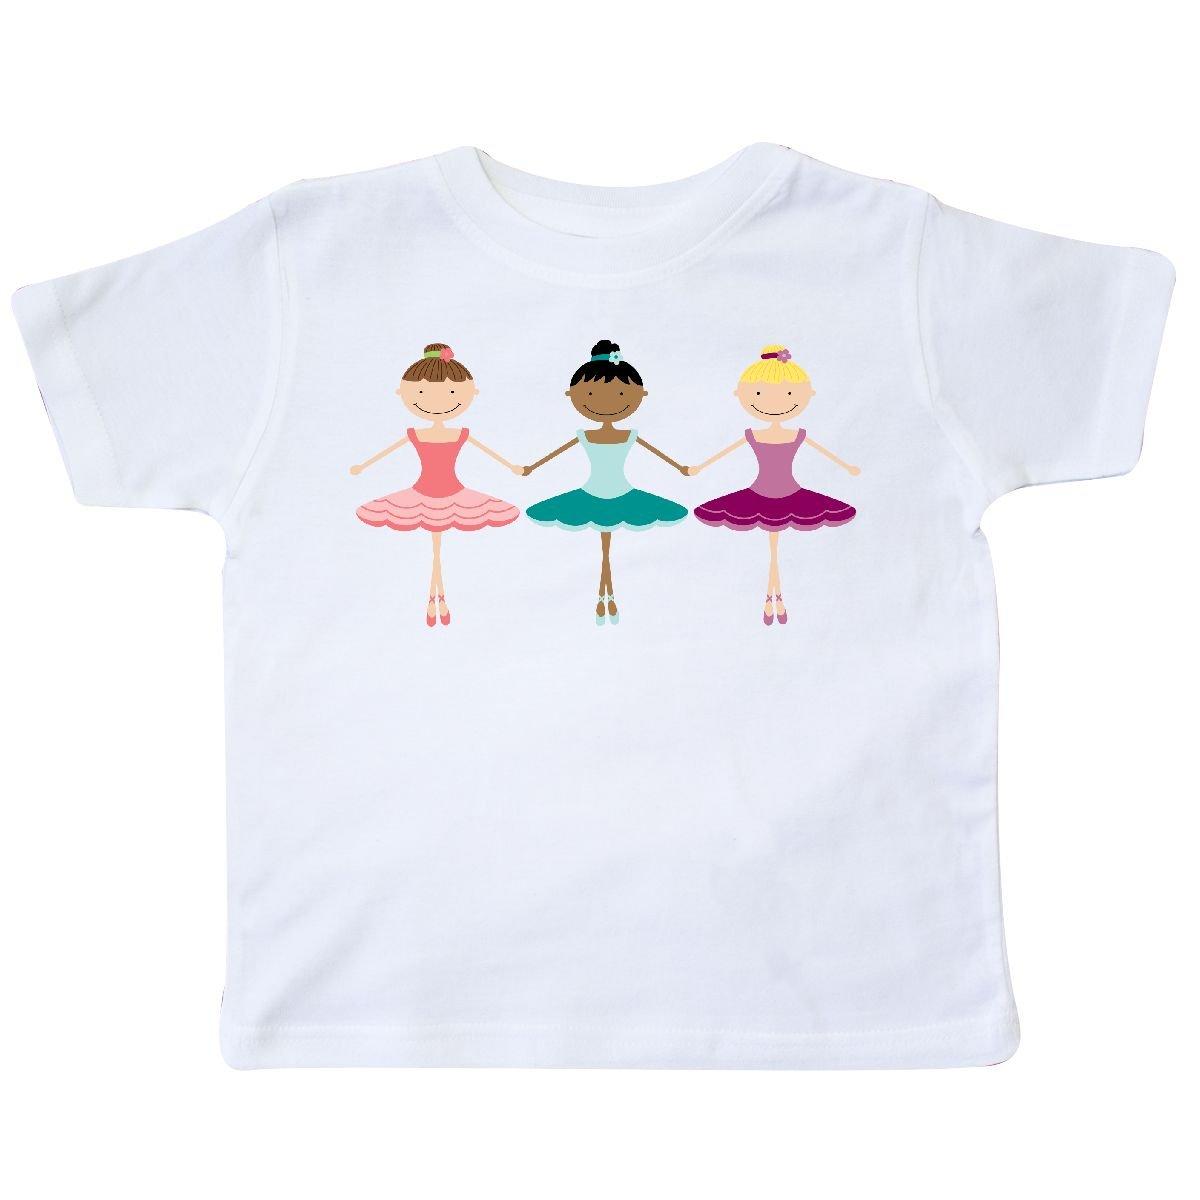 inktastic - Little Ballerina Trio Toddler T-Shirt c62a 14-50730-164